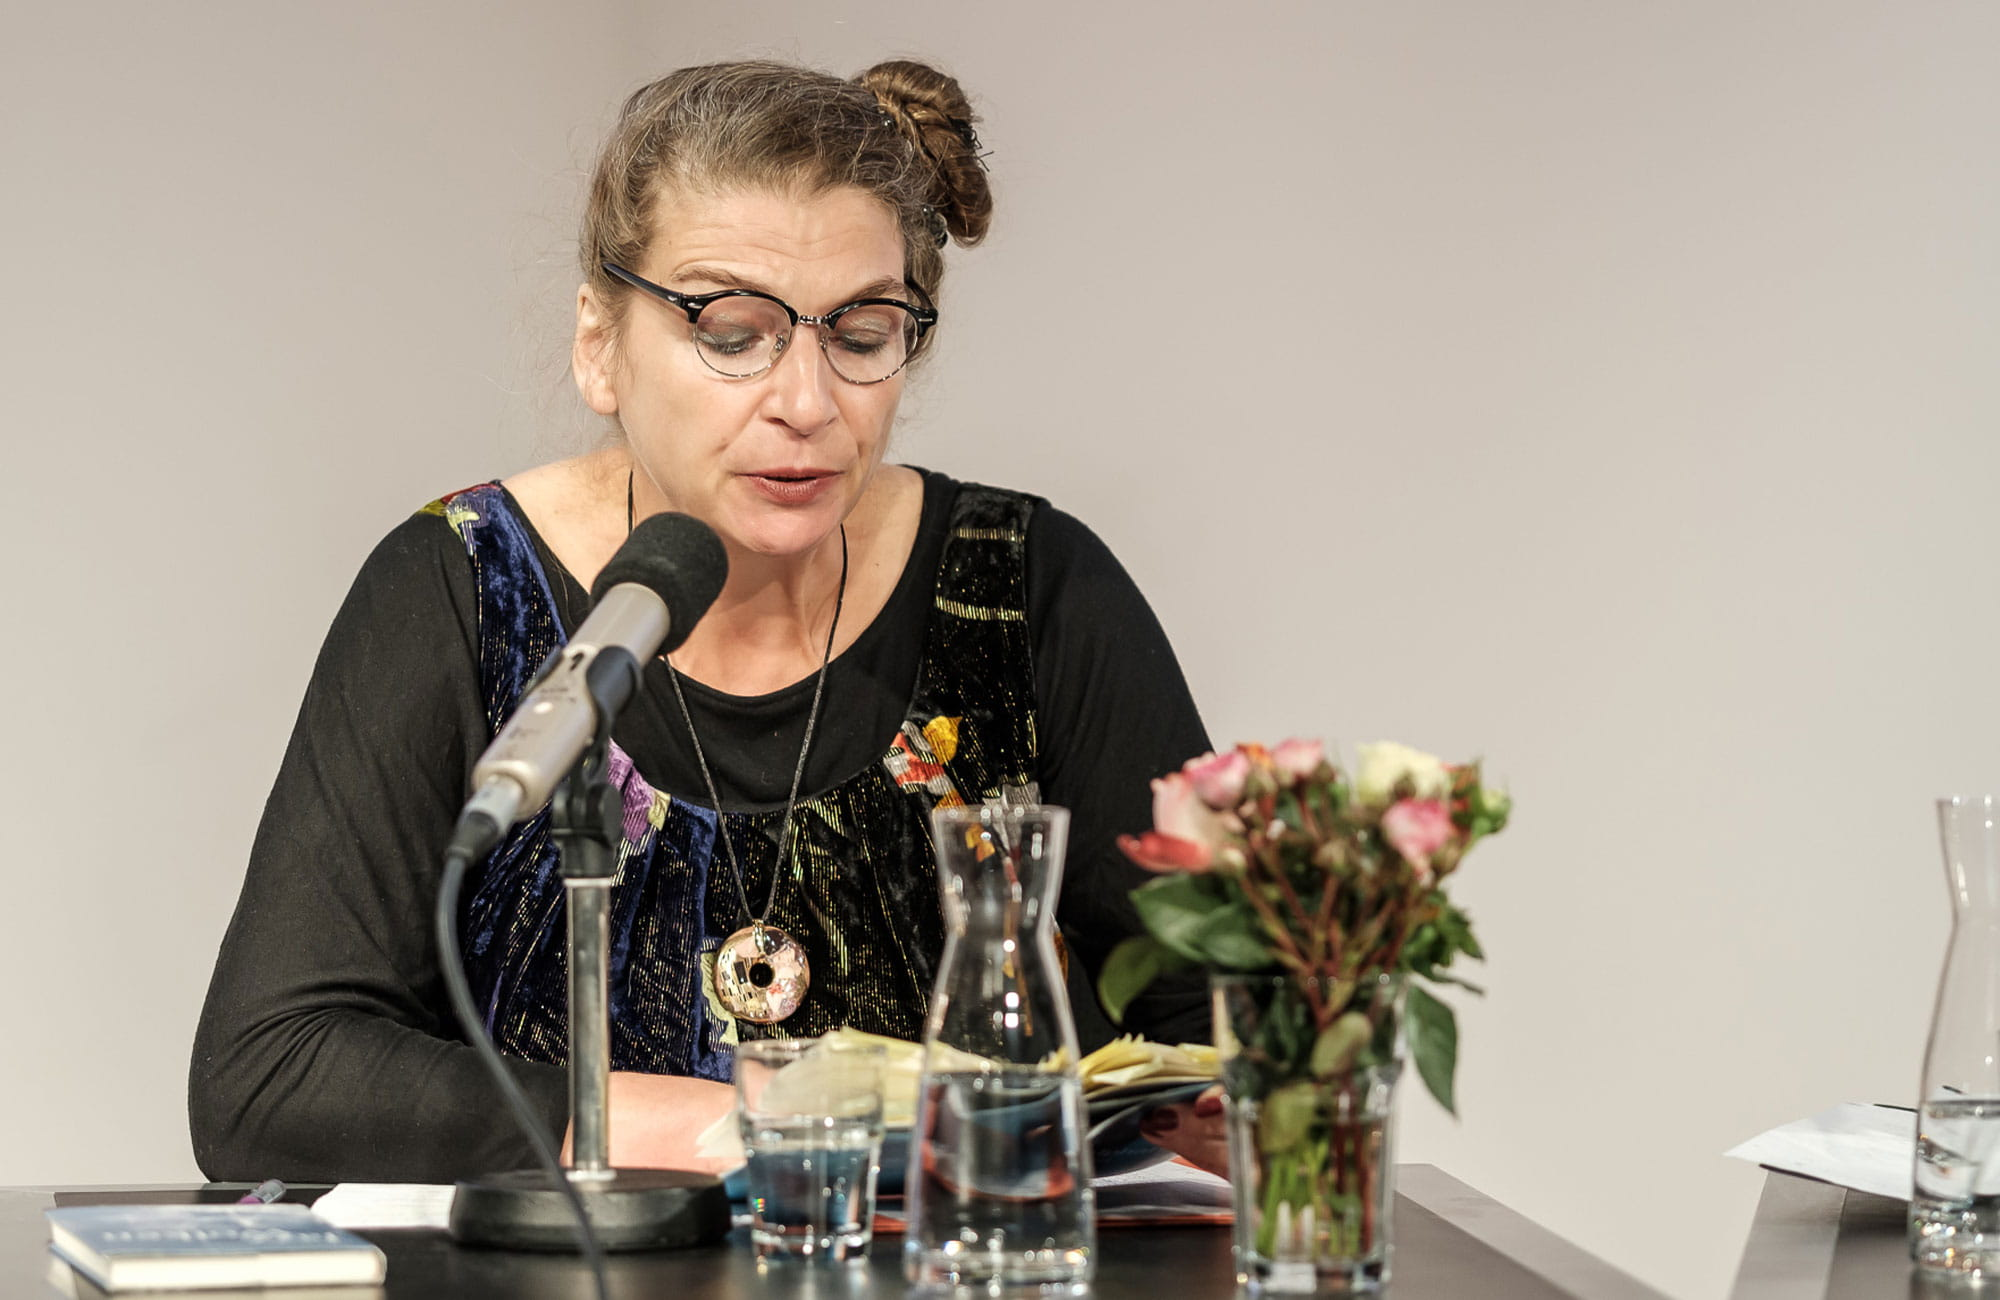 Maren Kames, Christine Langer, Kathrin Schmidt: Stuttgarter Lyriknacht 2019,                                                               Freitag, 06.09.19               /                   19.00              Uhr                               <br/>(c) Sebastian Wenzel